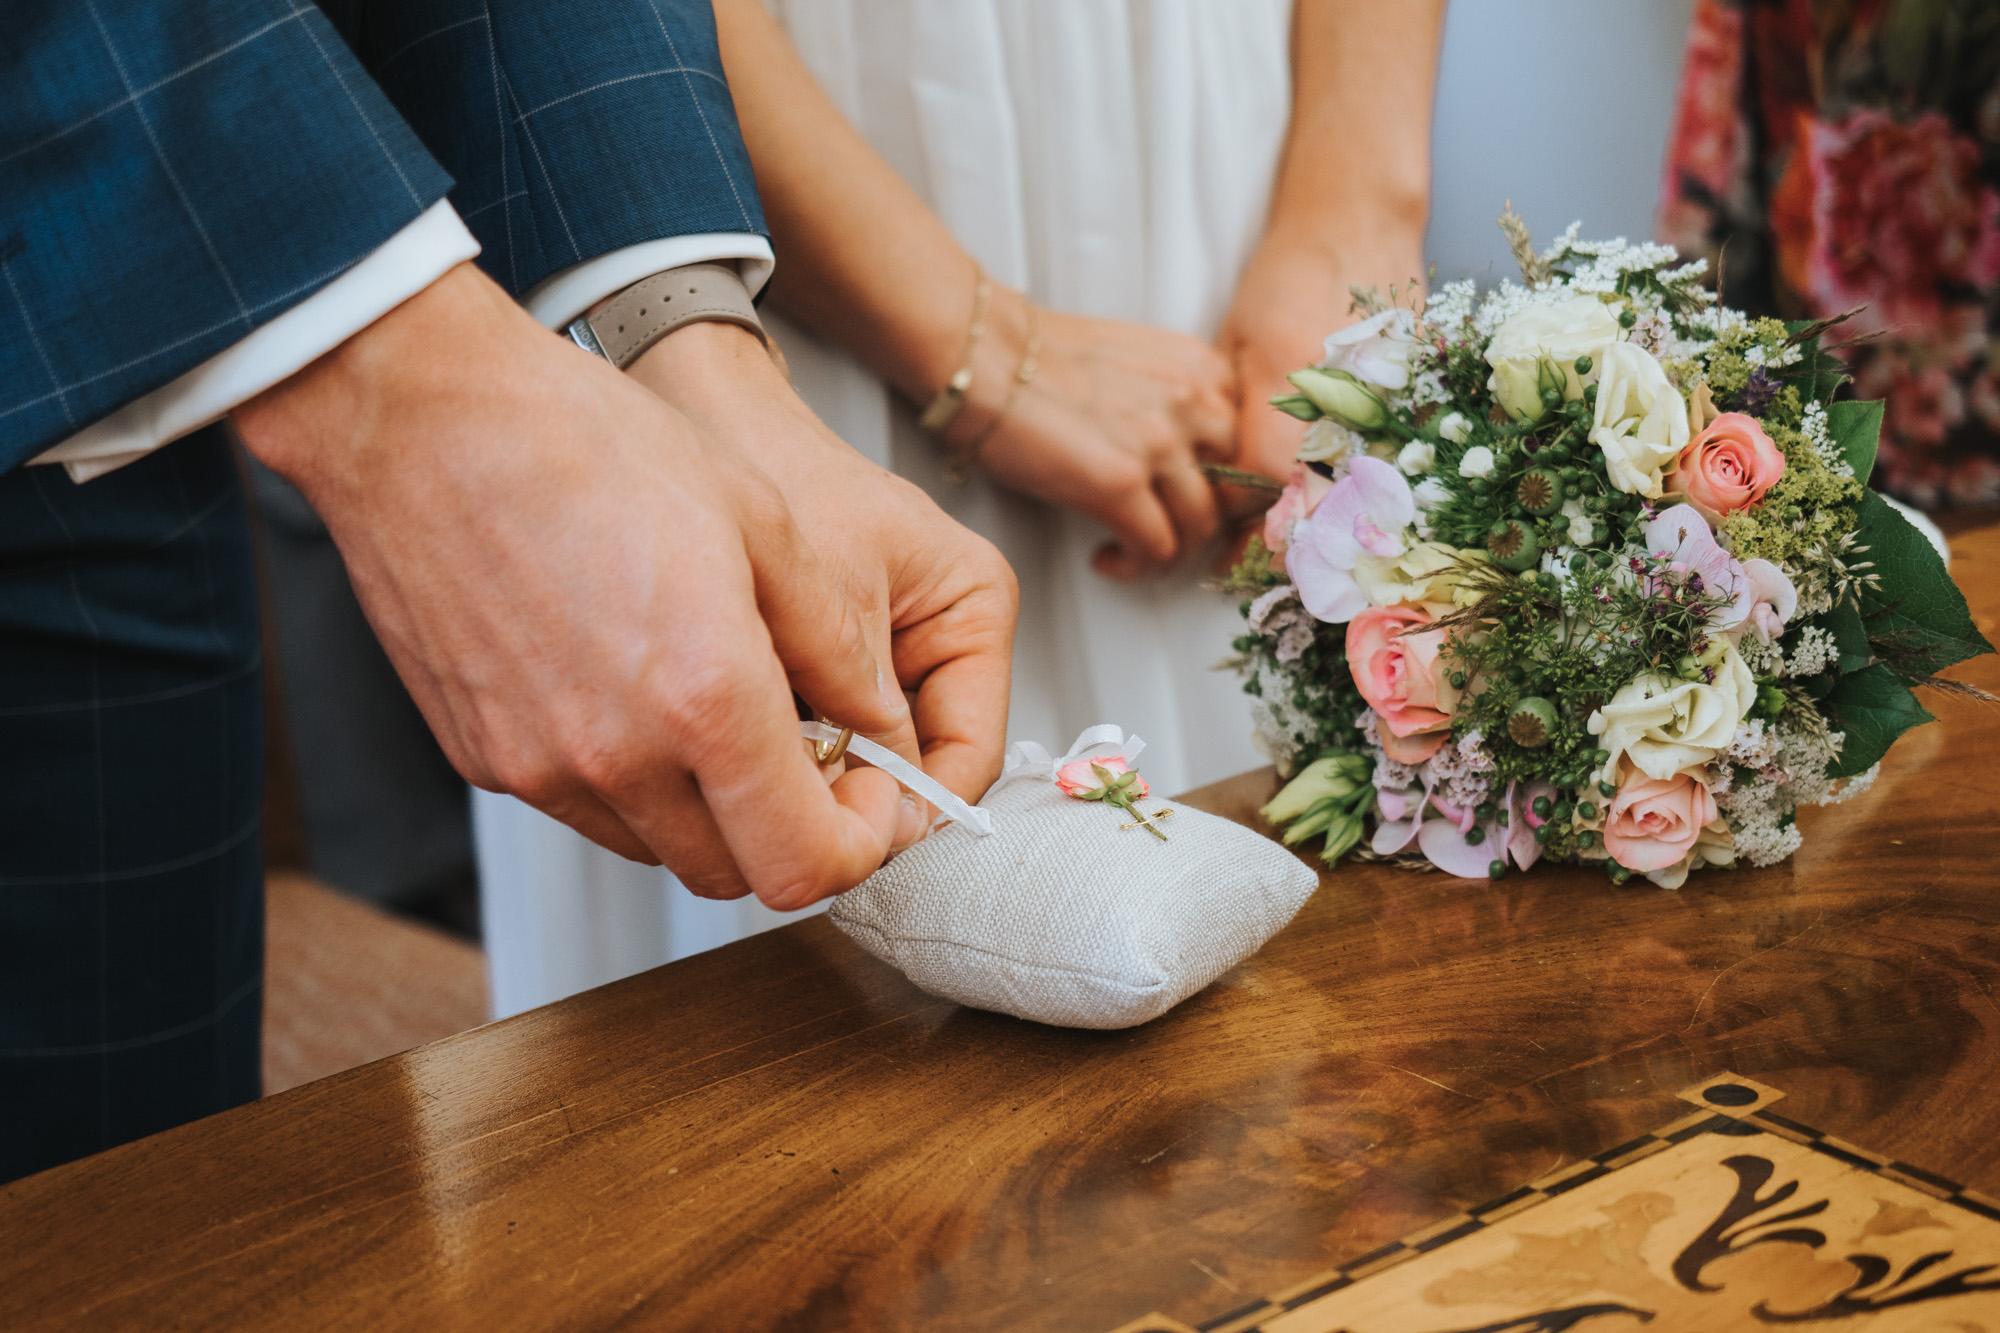 Hochzeit-Memory-factory-20180630-0015.jpg